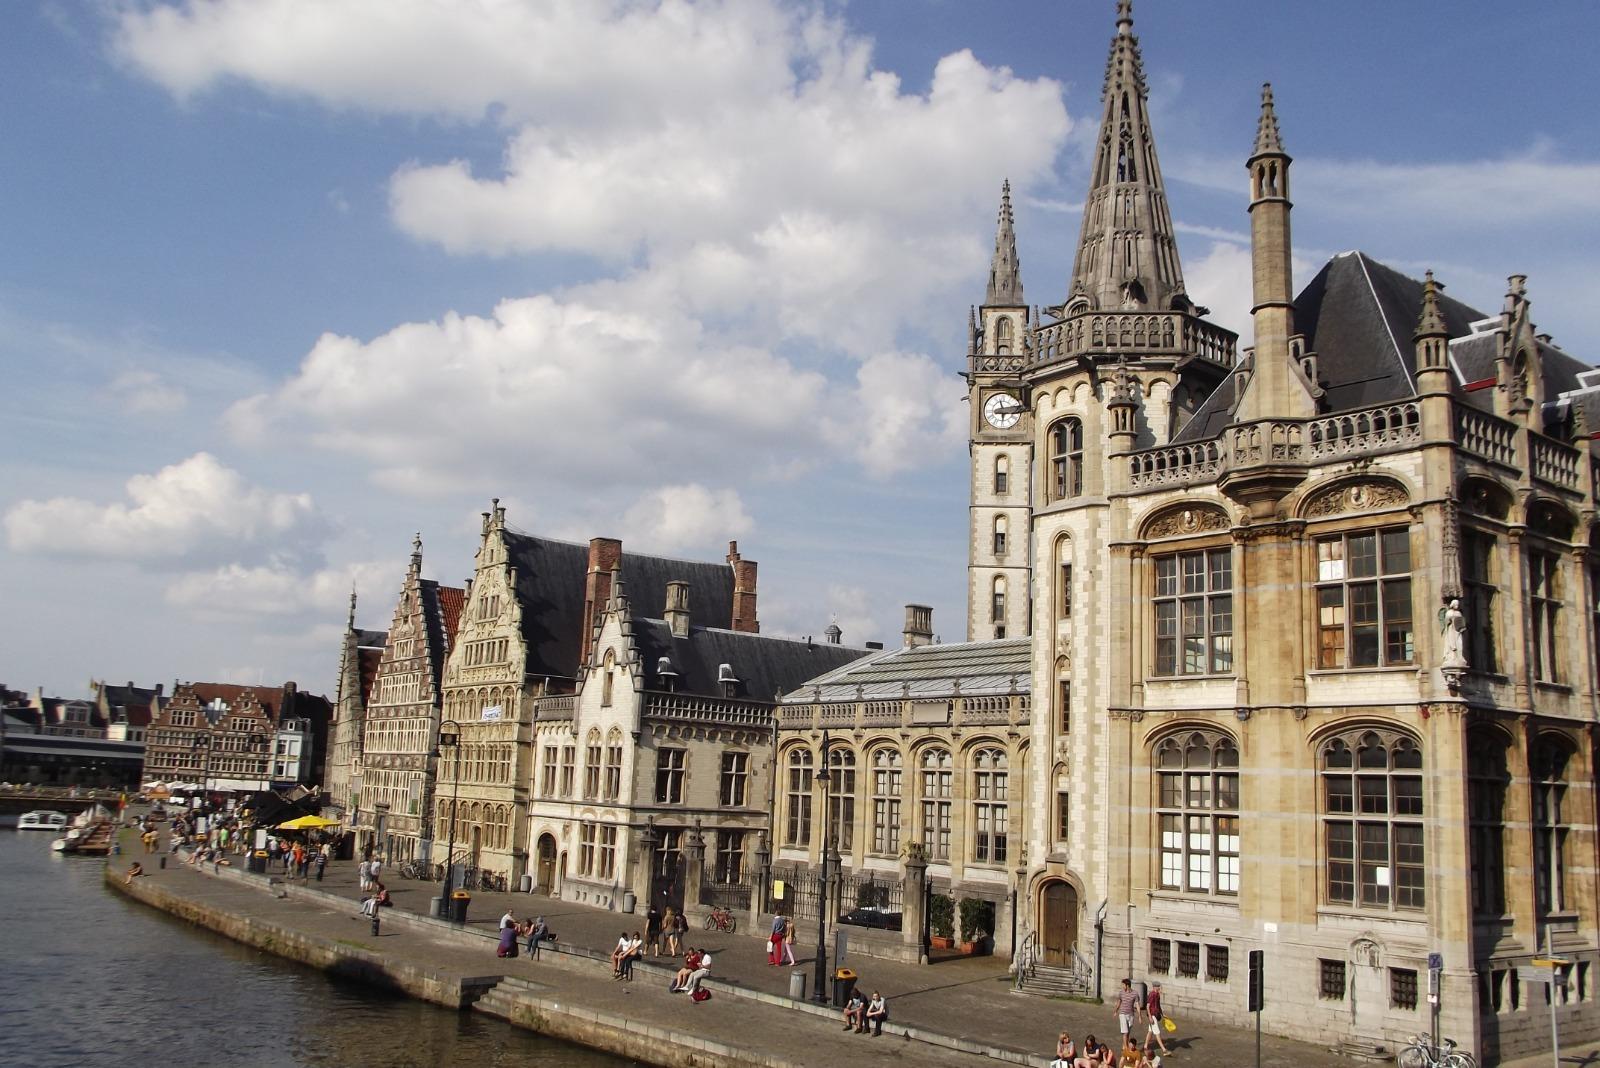 belgioelussemburgo40-1600419017.jpg